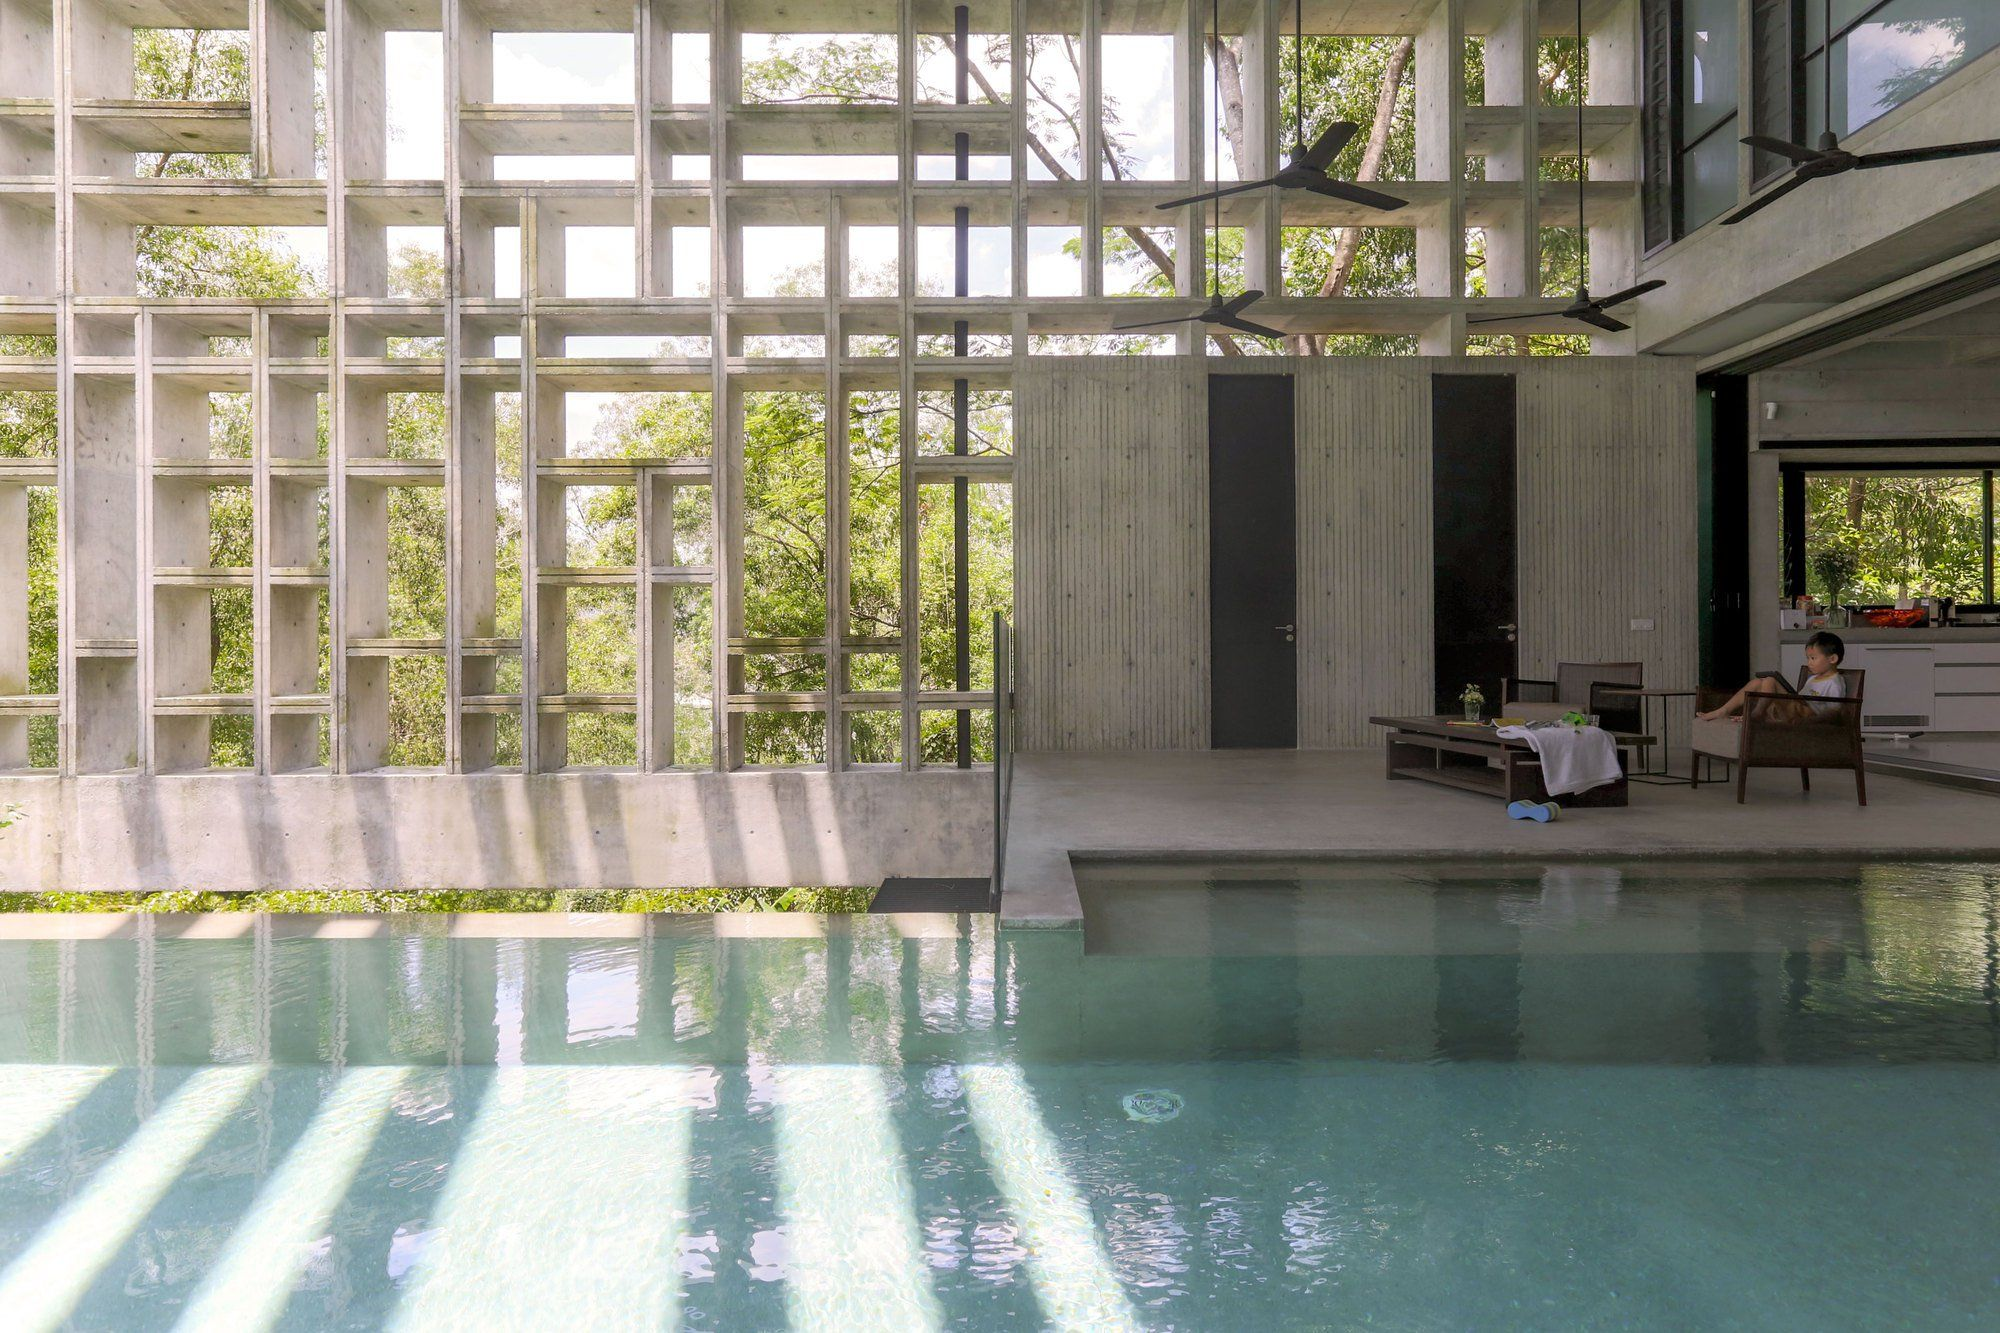 Casa Caja tropical / WHBC Architects